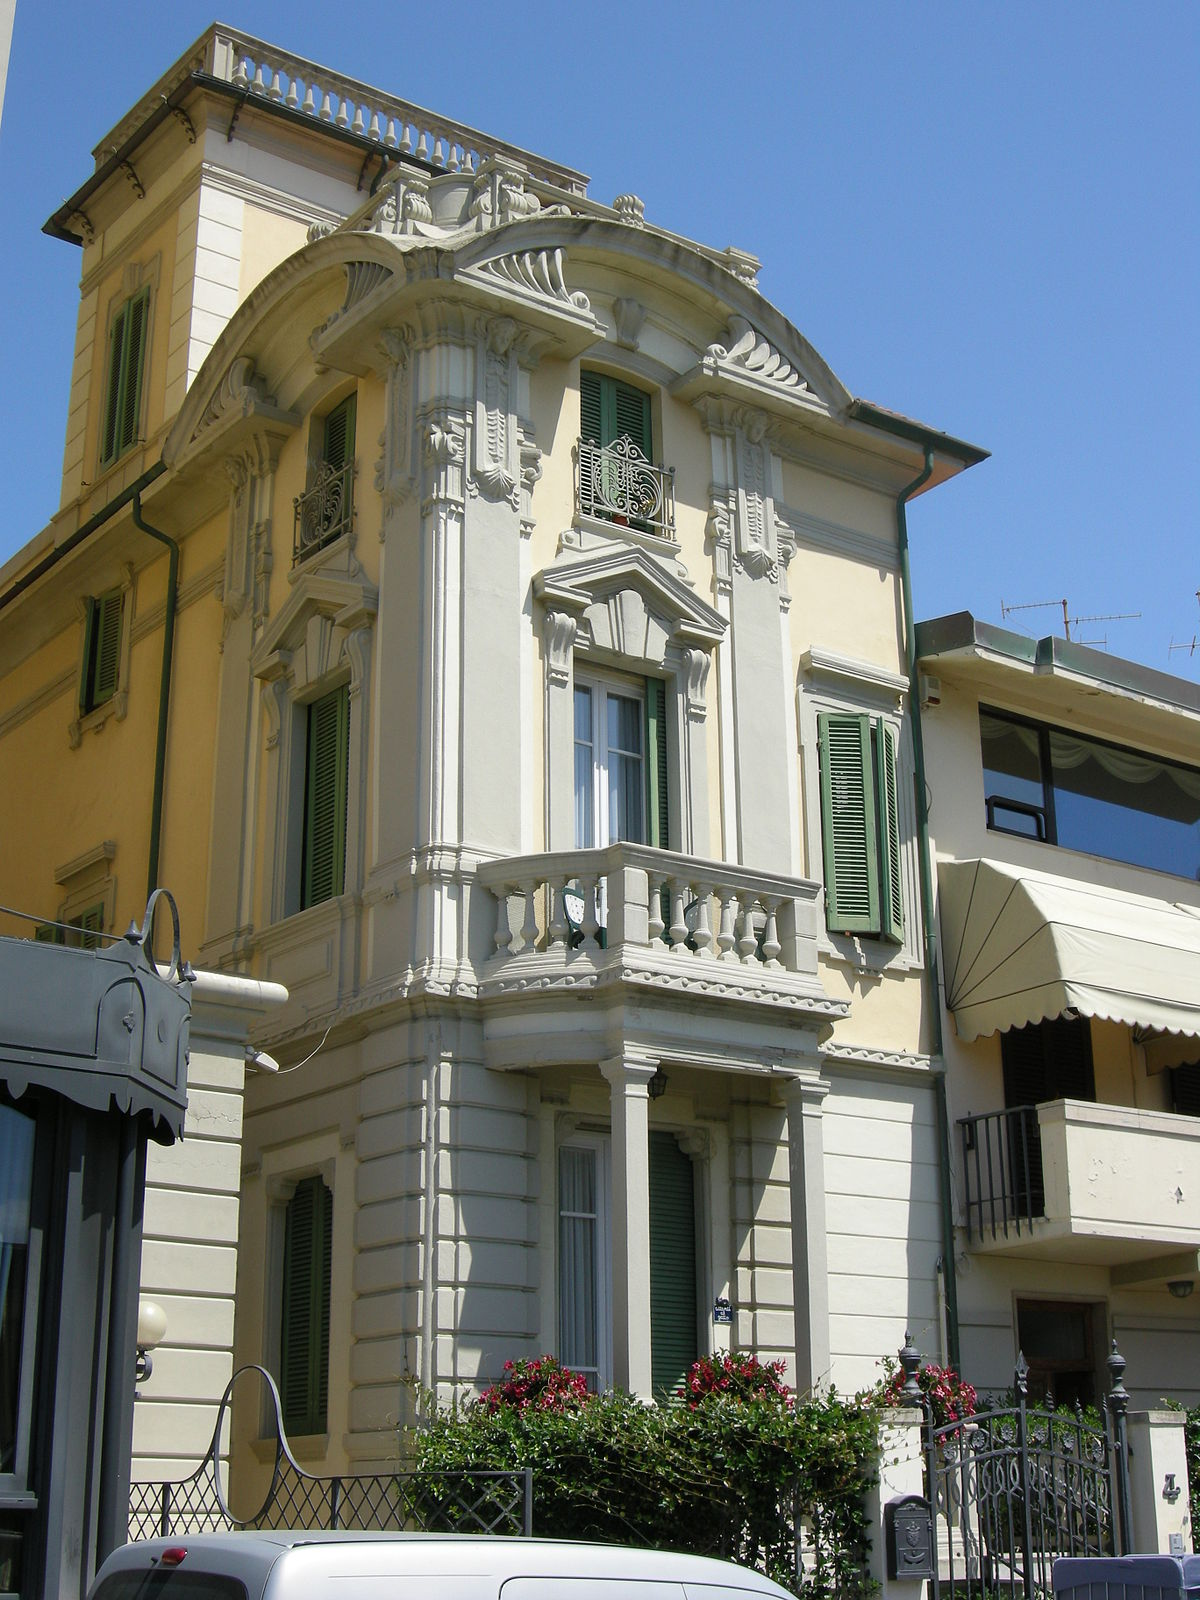 Vendita Appartamenti Verona